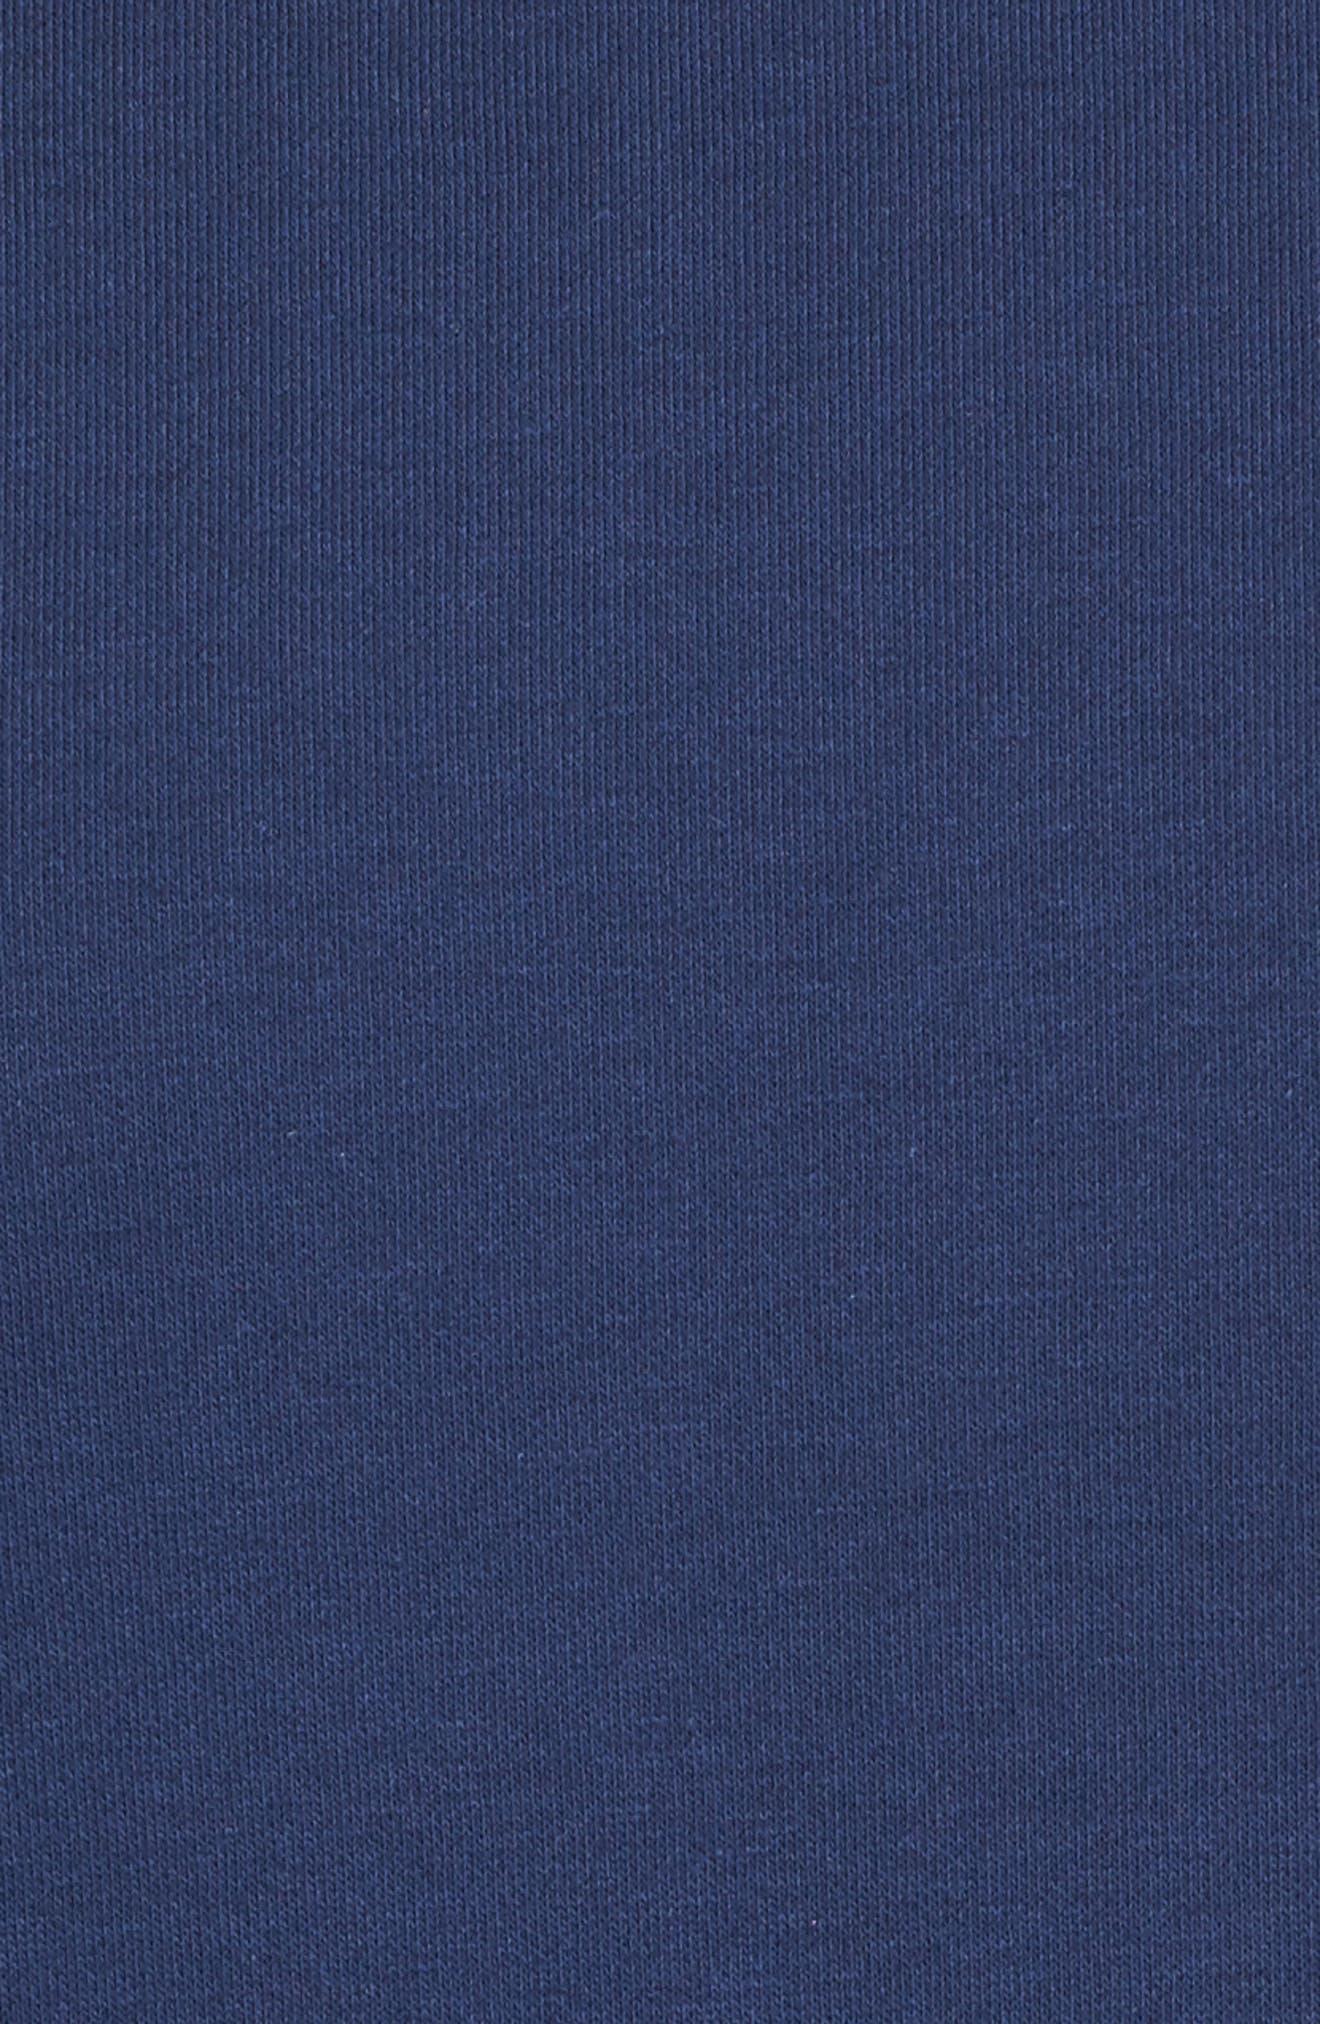 Blouson Sleeve Sweatshirt,                             Alternate thumbnail 24, color,